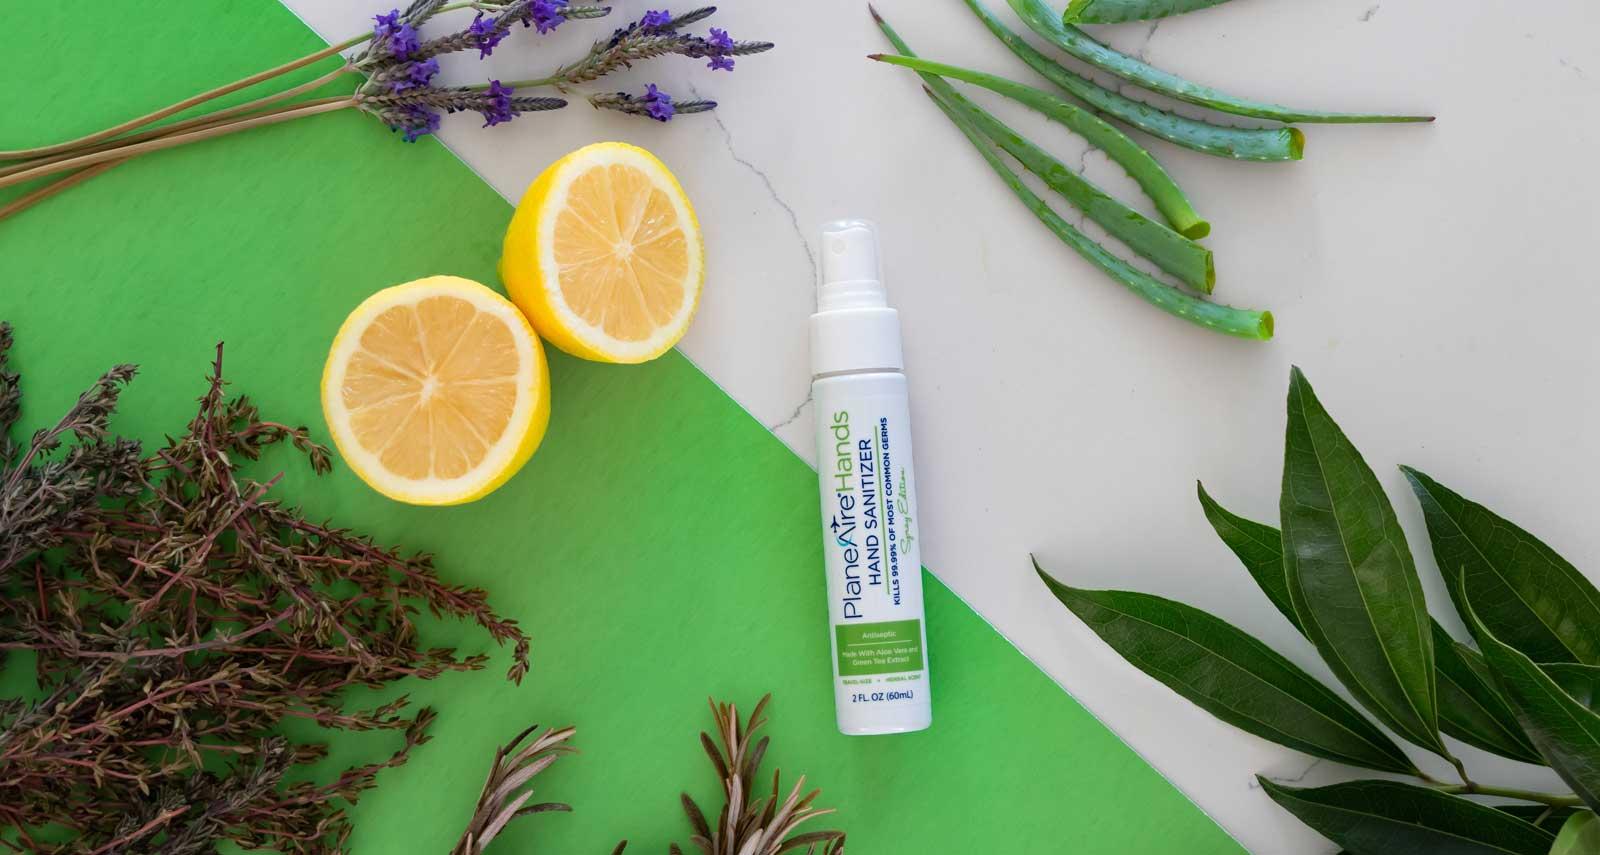 Travel Hand Sanitizer Spray